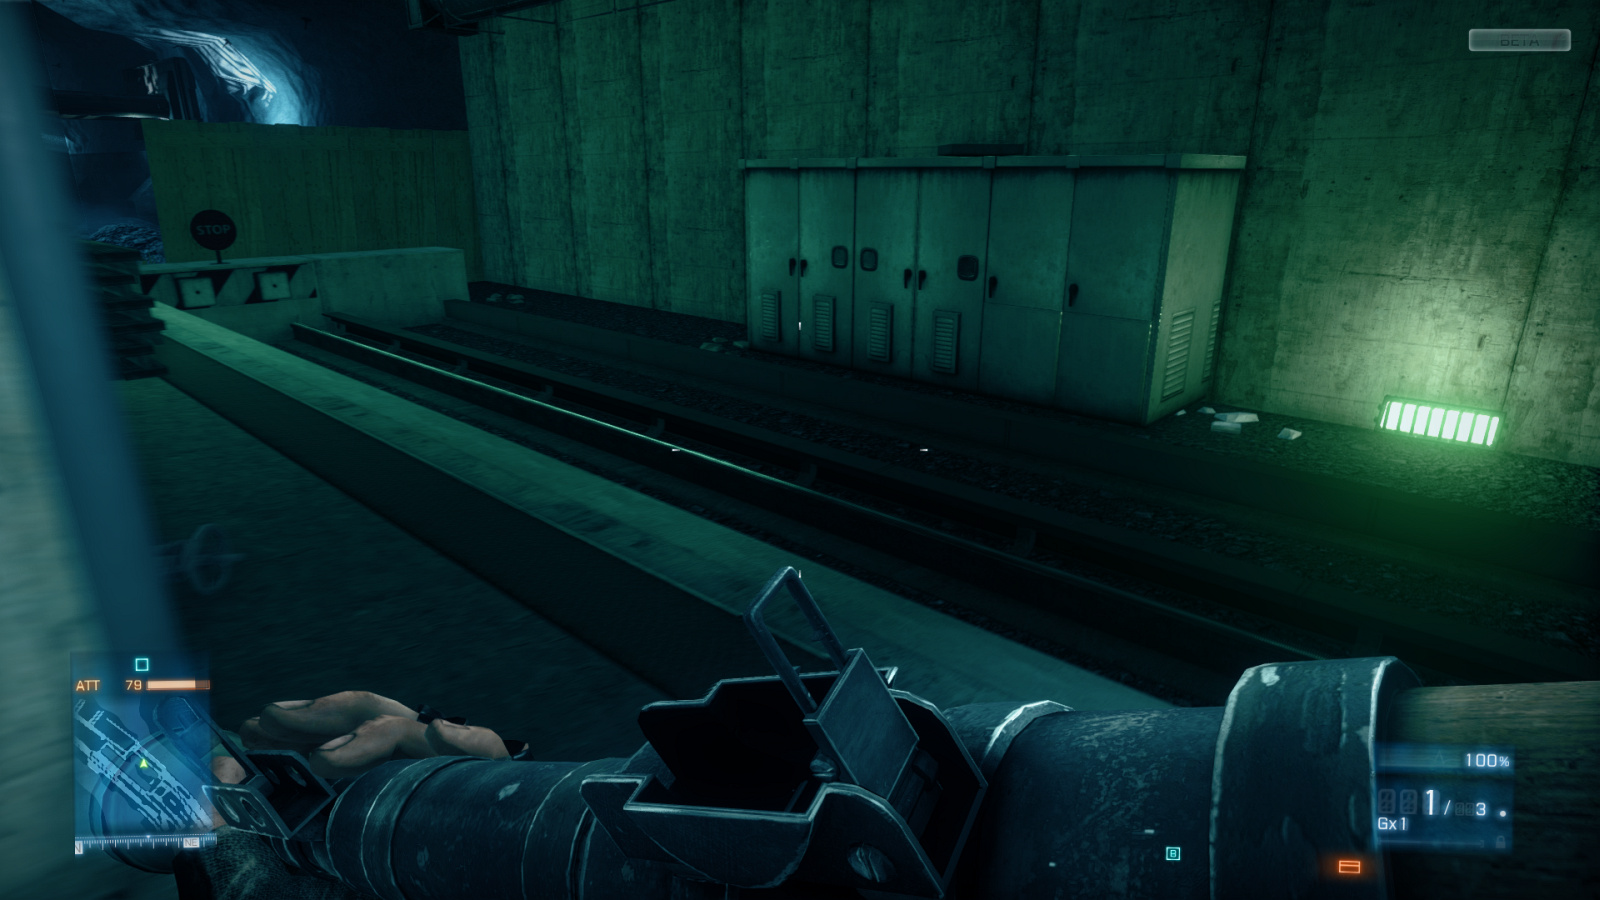 Beta Battlefieldu 3 je live – hratelnost, grafika, galerie 52436